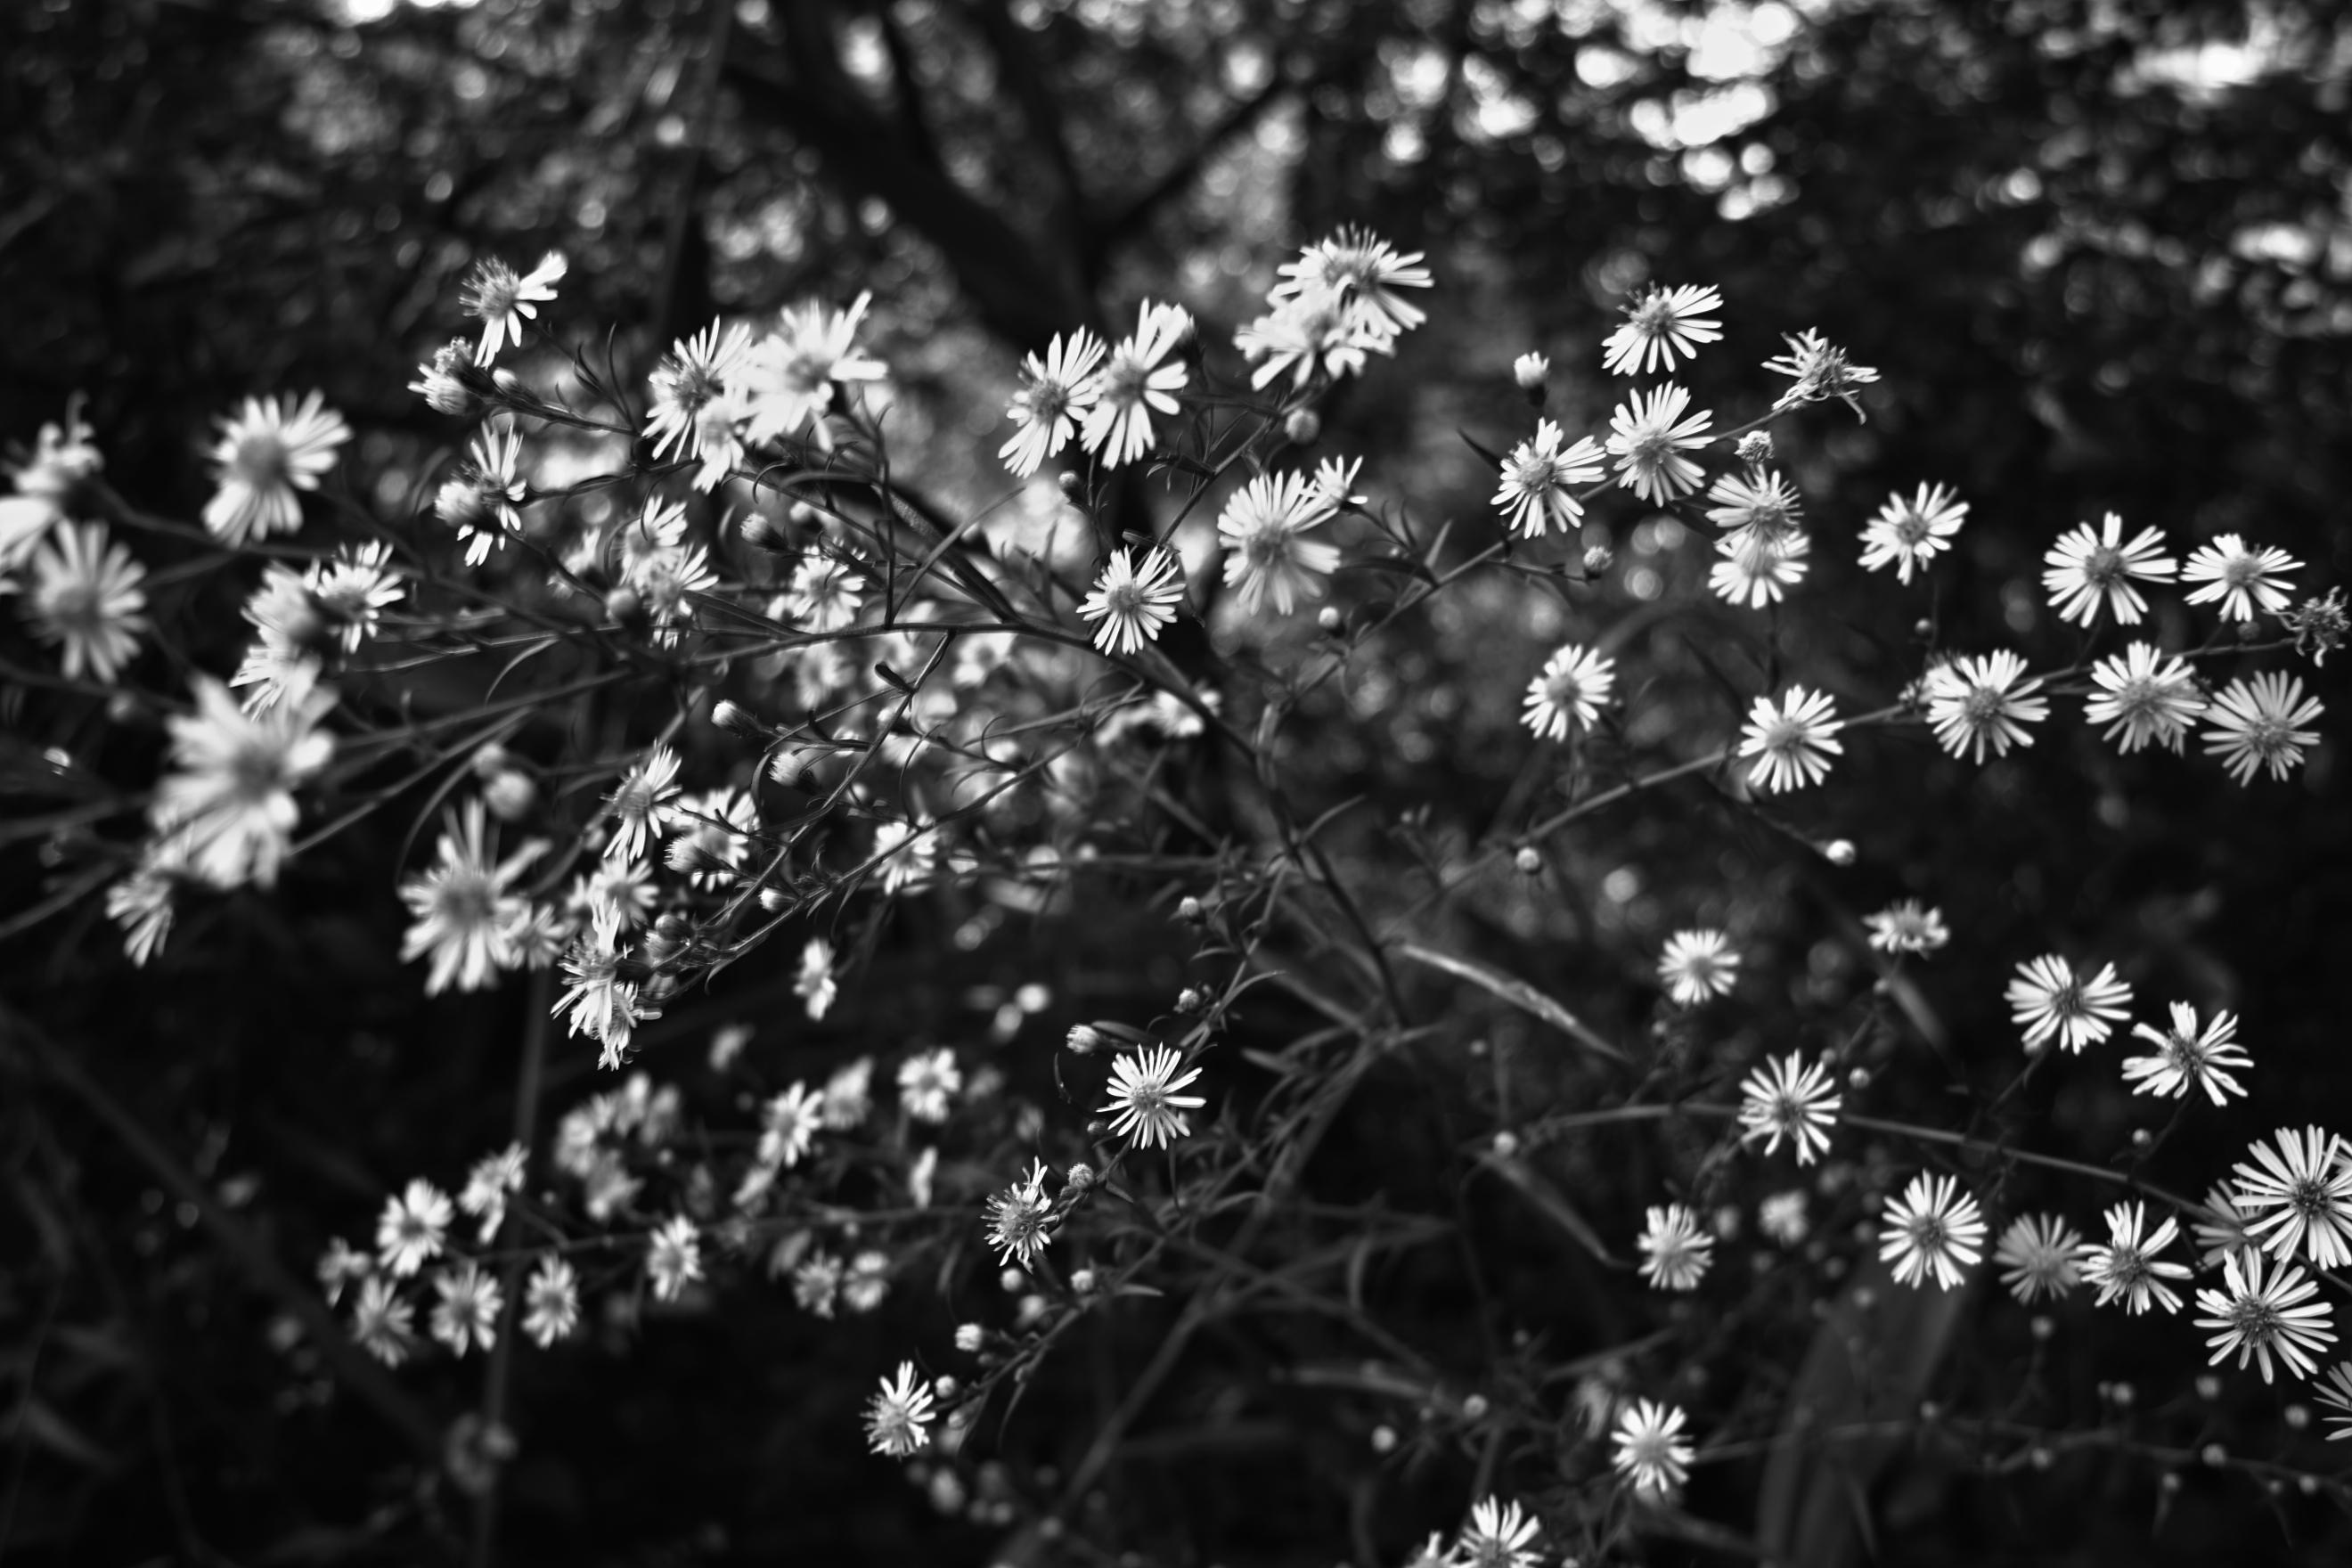 Daisy flower tumblr pink black and white flowers wallpaper wallpapersafari izmirmasajfo